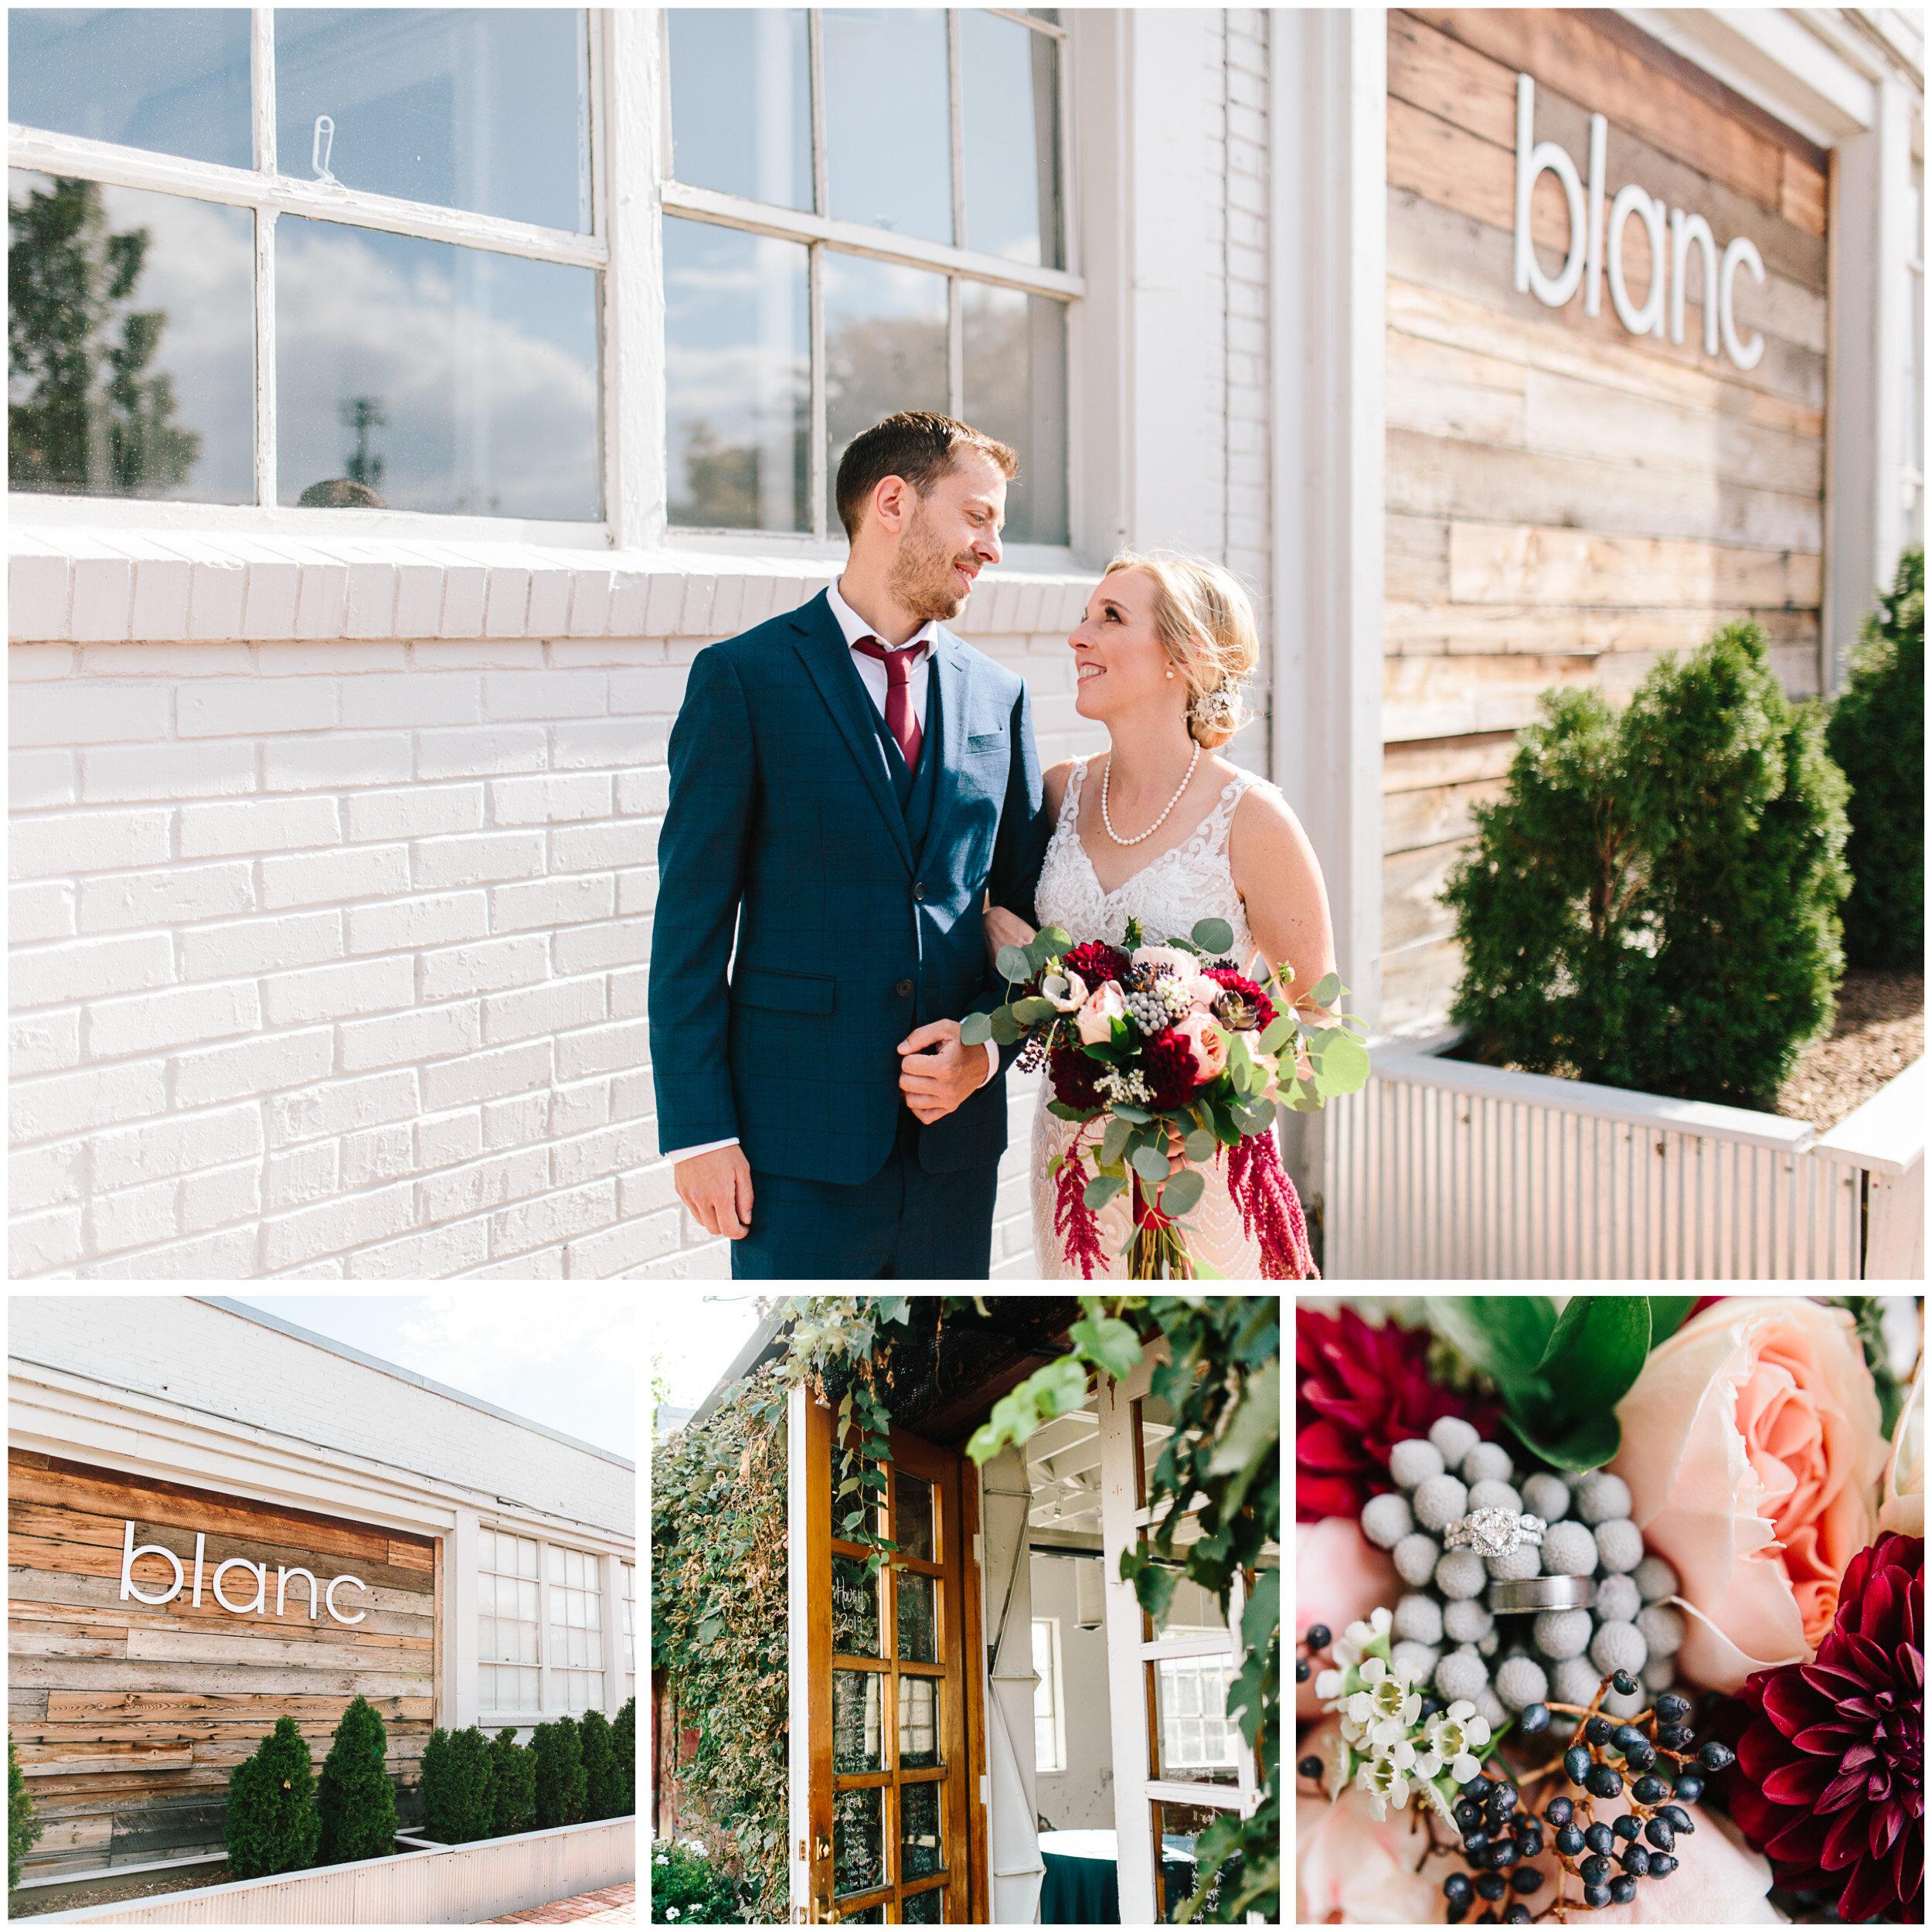 Blanc_Denver_Wedding_header_.jpg